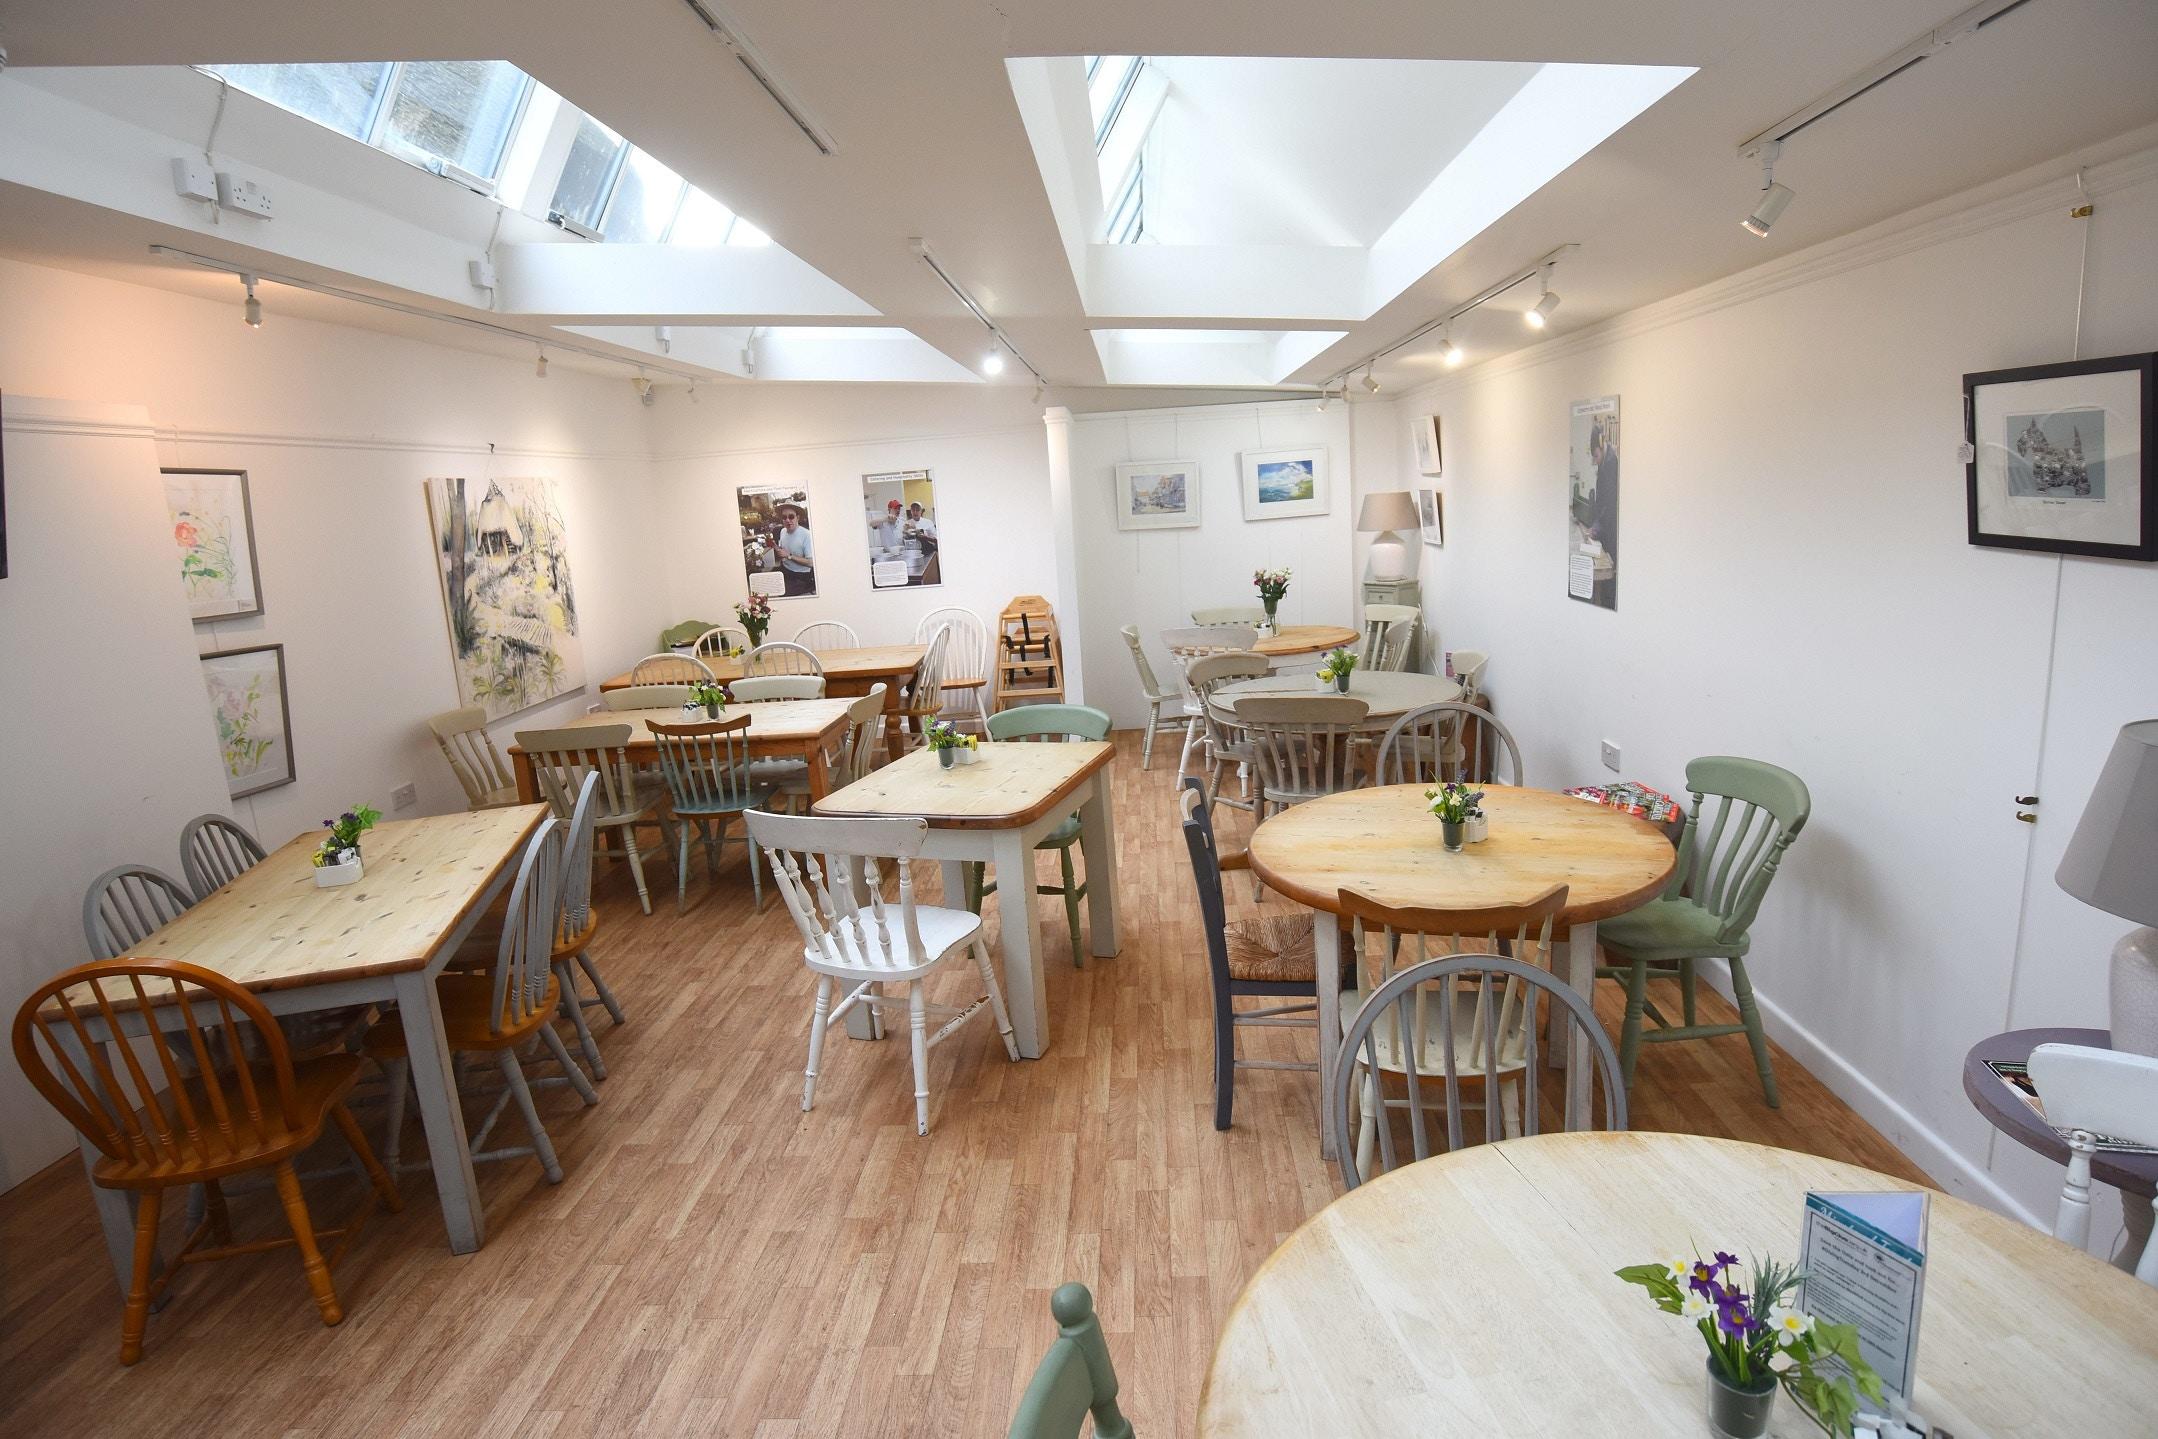 Furzey tea rooms interior